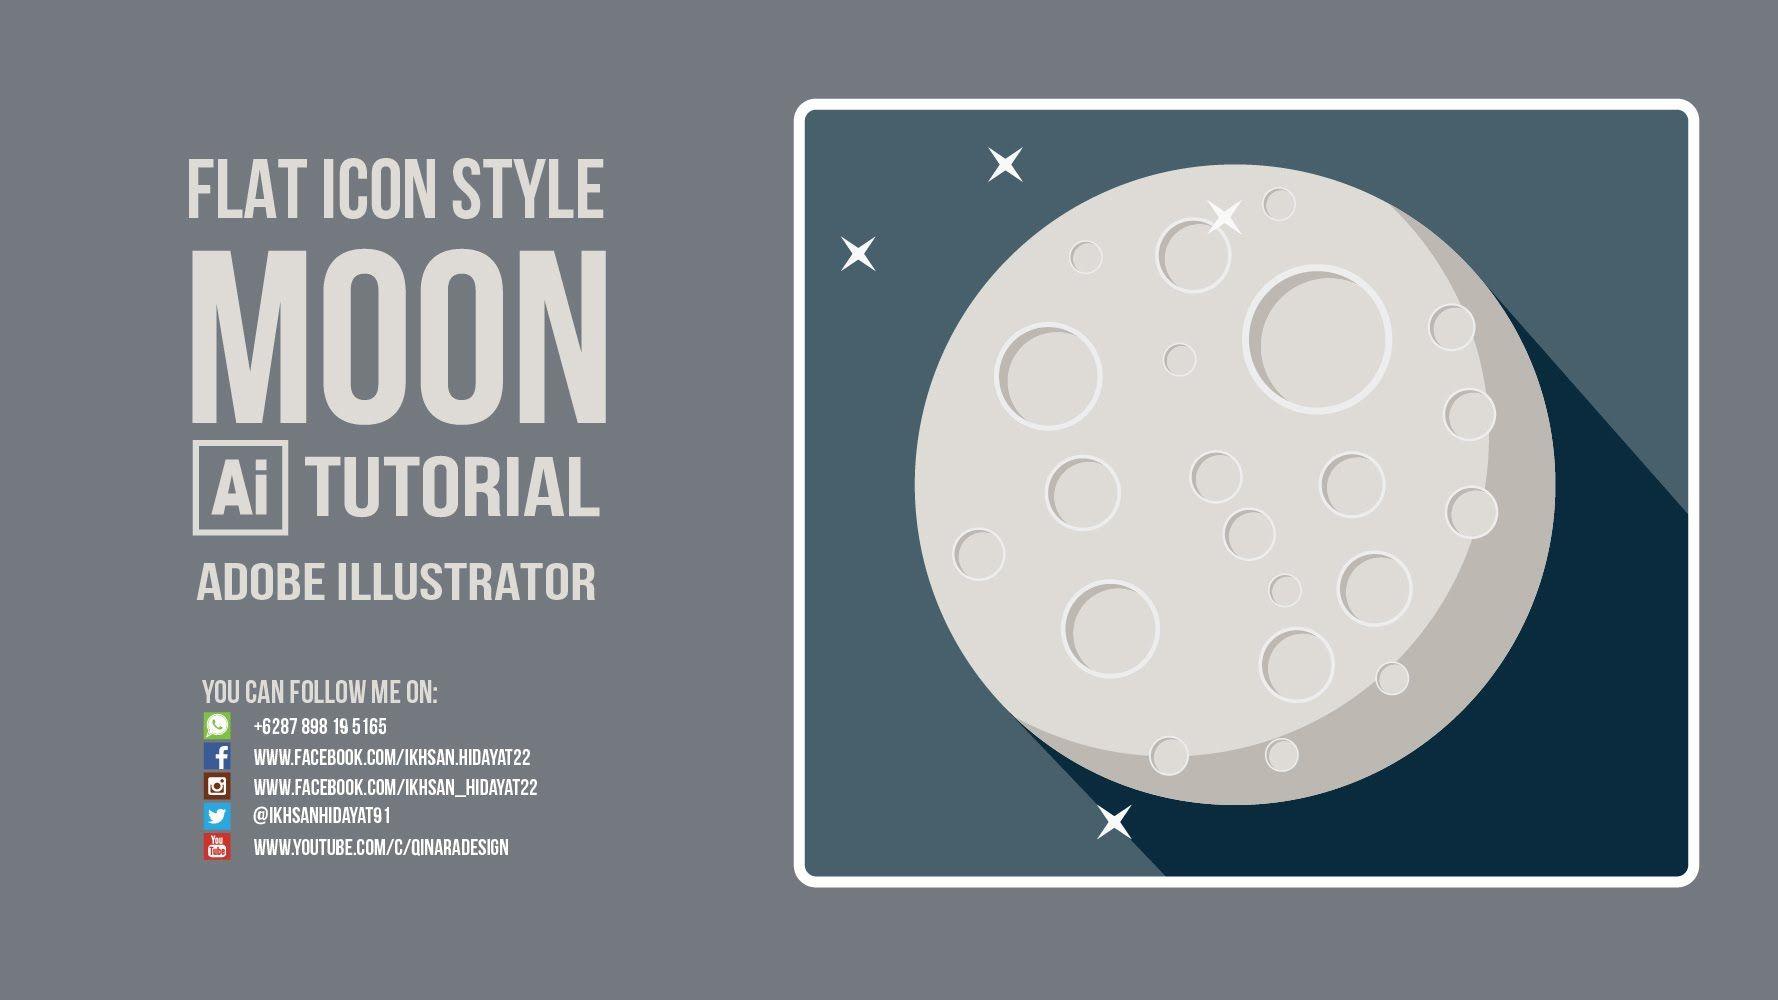 Flat Style Tutorial Moon Flat Icon Adobe Illustrator Cc 2015 Illustrator Tutorials Adobe Illustrator Tutorial